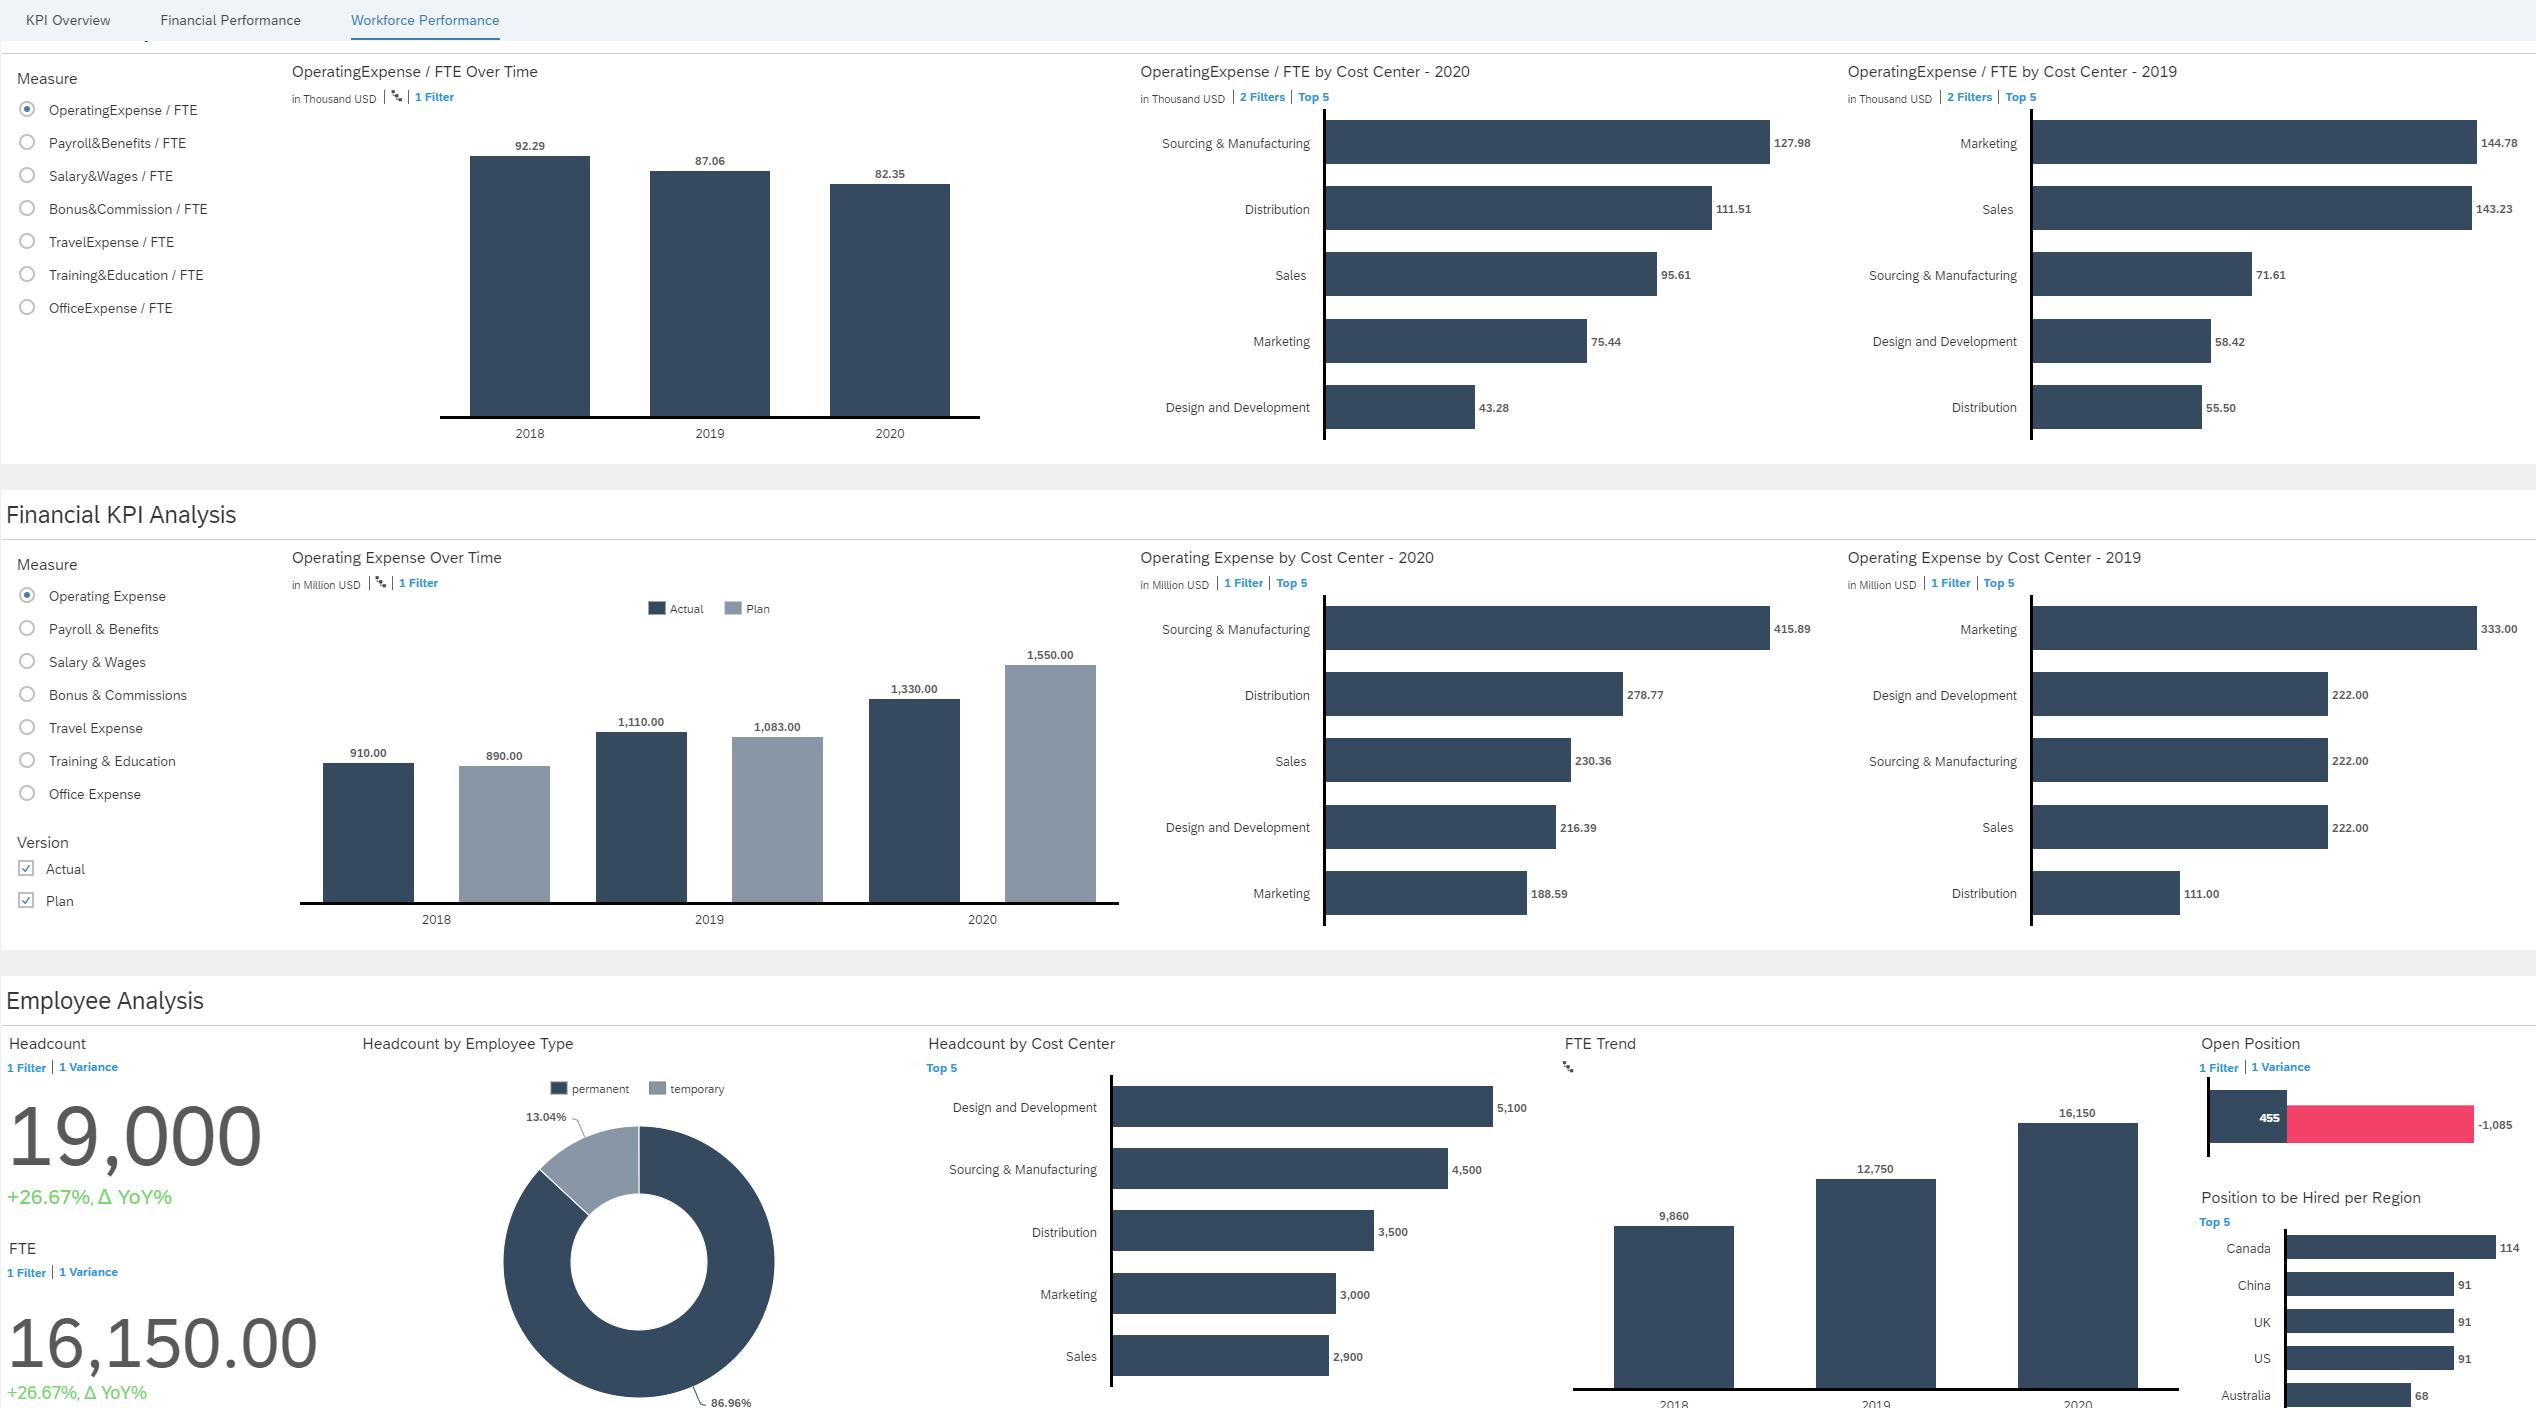 Figure%203%3A%20Financial%20analytics%20dashboard%20available%20through%20SAP%20Analytics%20Cloud